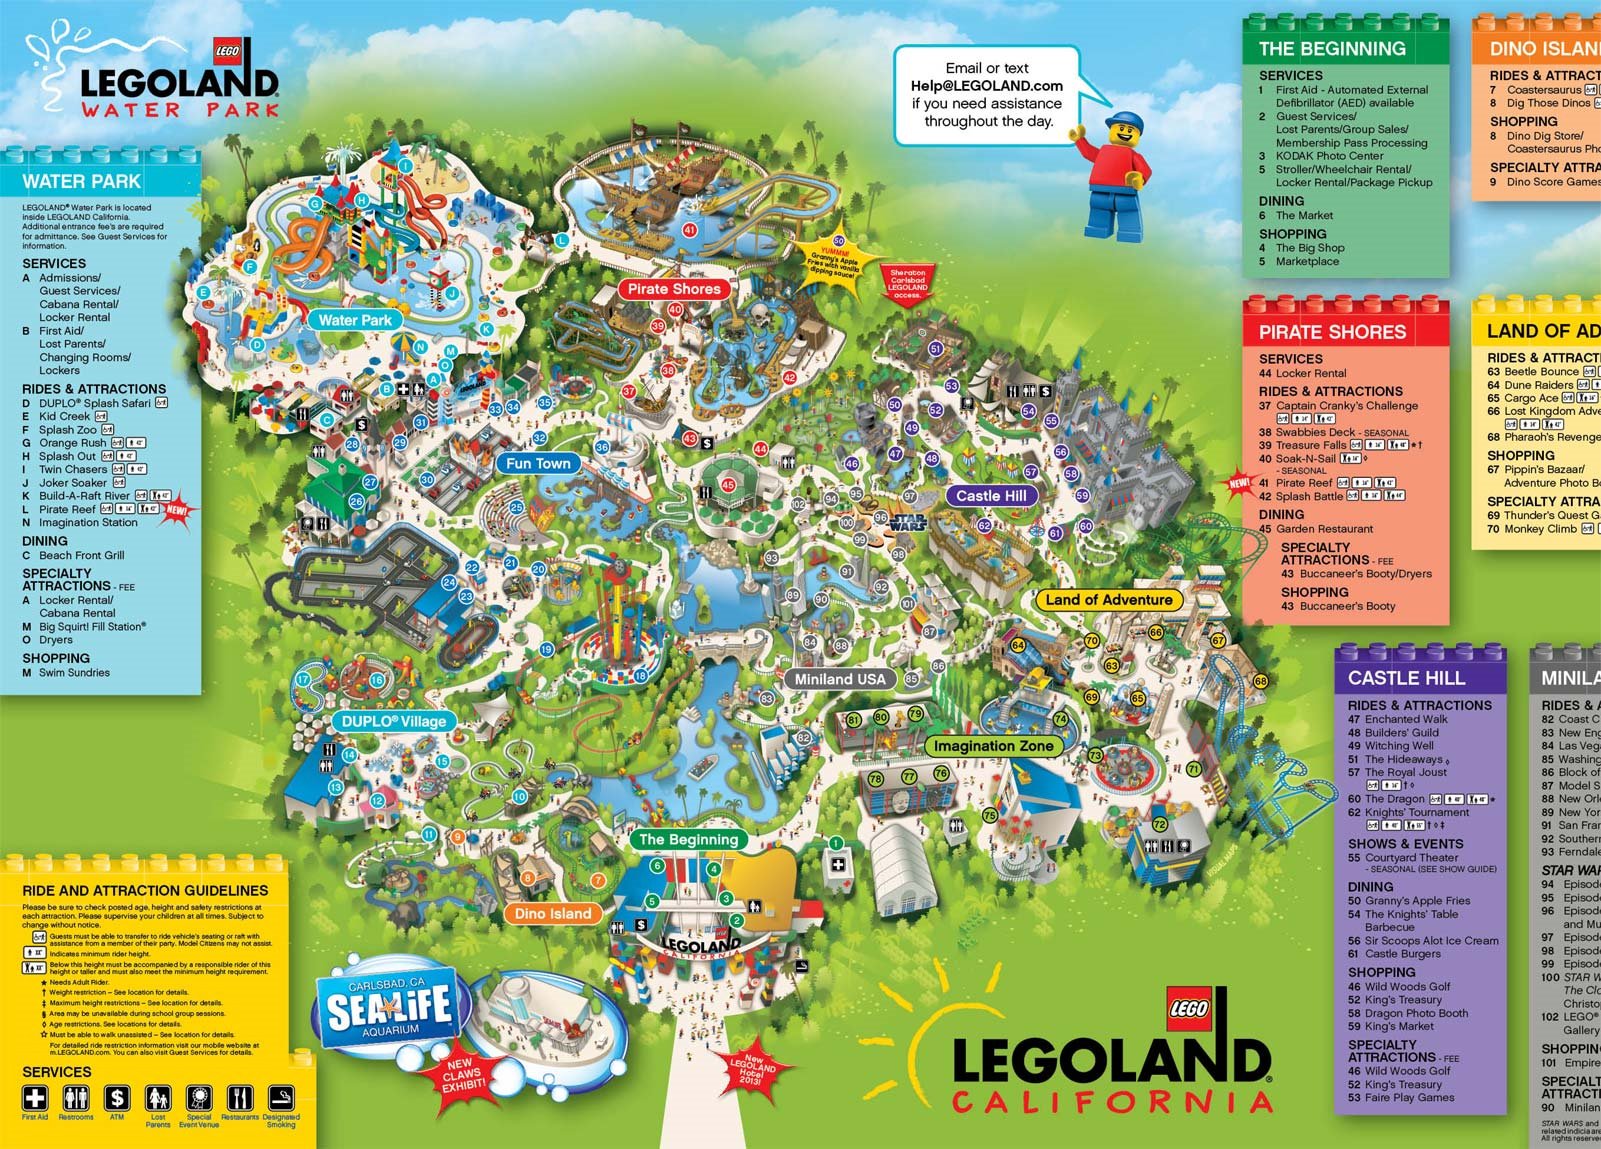 Febceba Maps Of California Map Of Legoland California - Klipy - Legoland Map California 2018